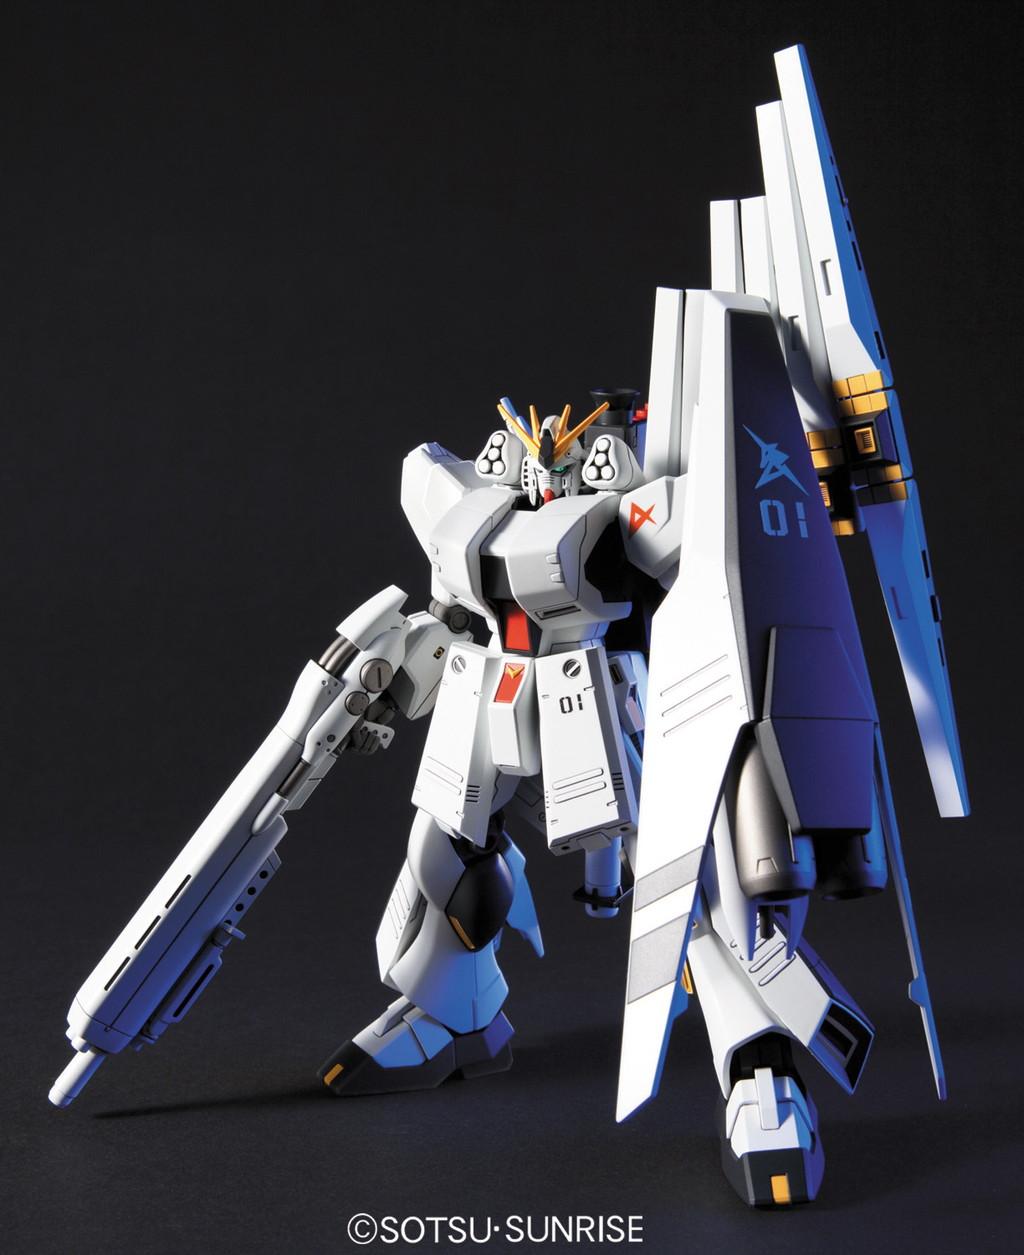 504HGUC 1/144 FA-93HWS νガンダム(ヘビー・ウエポン・システム装備型)[ν Gundam HWS]